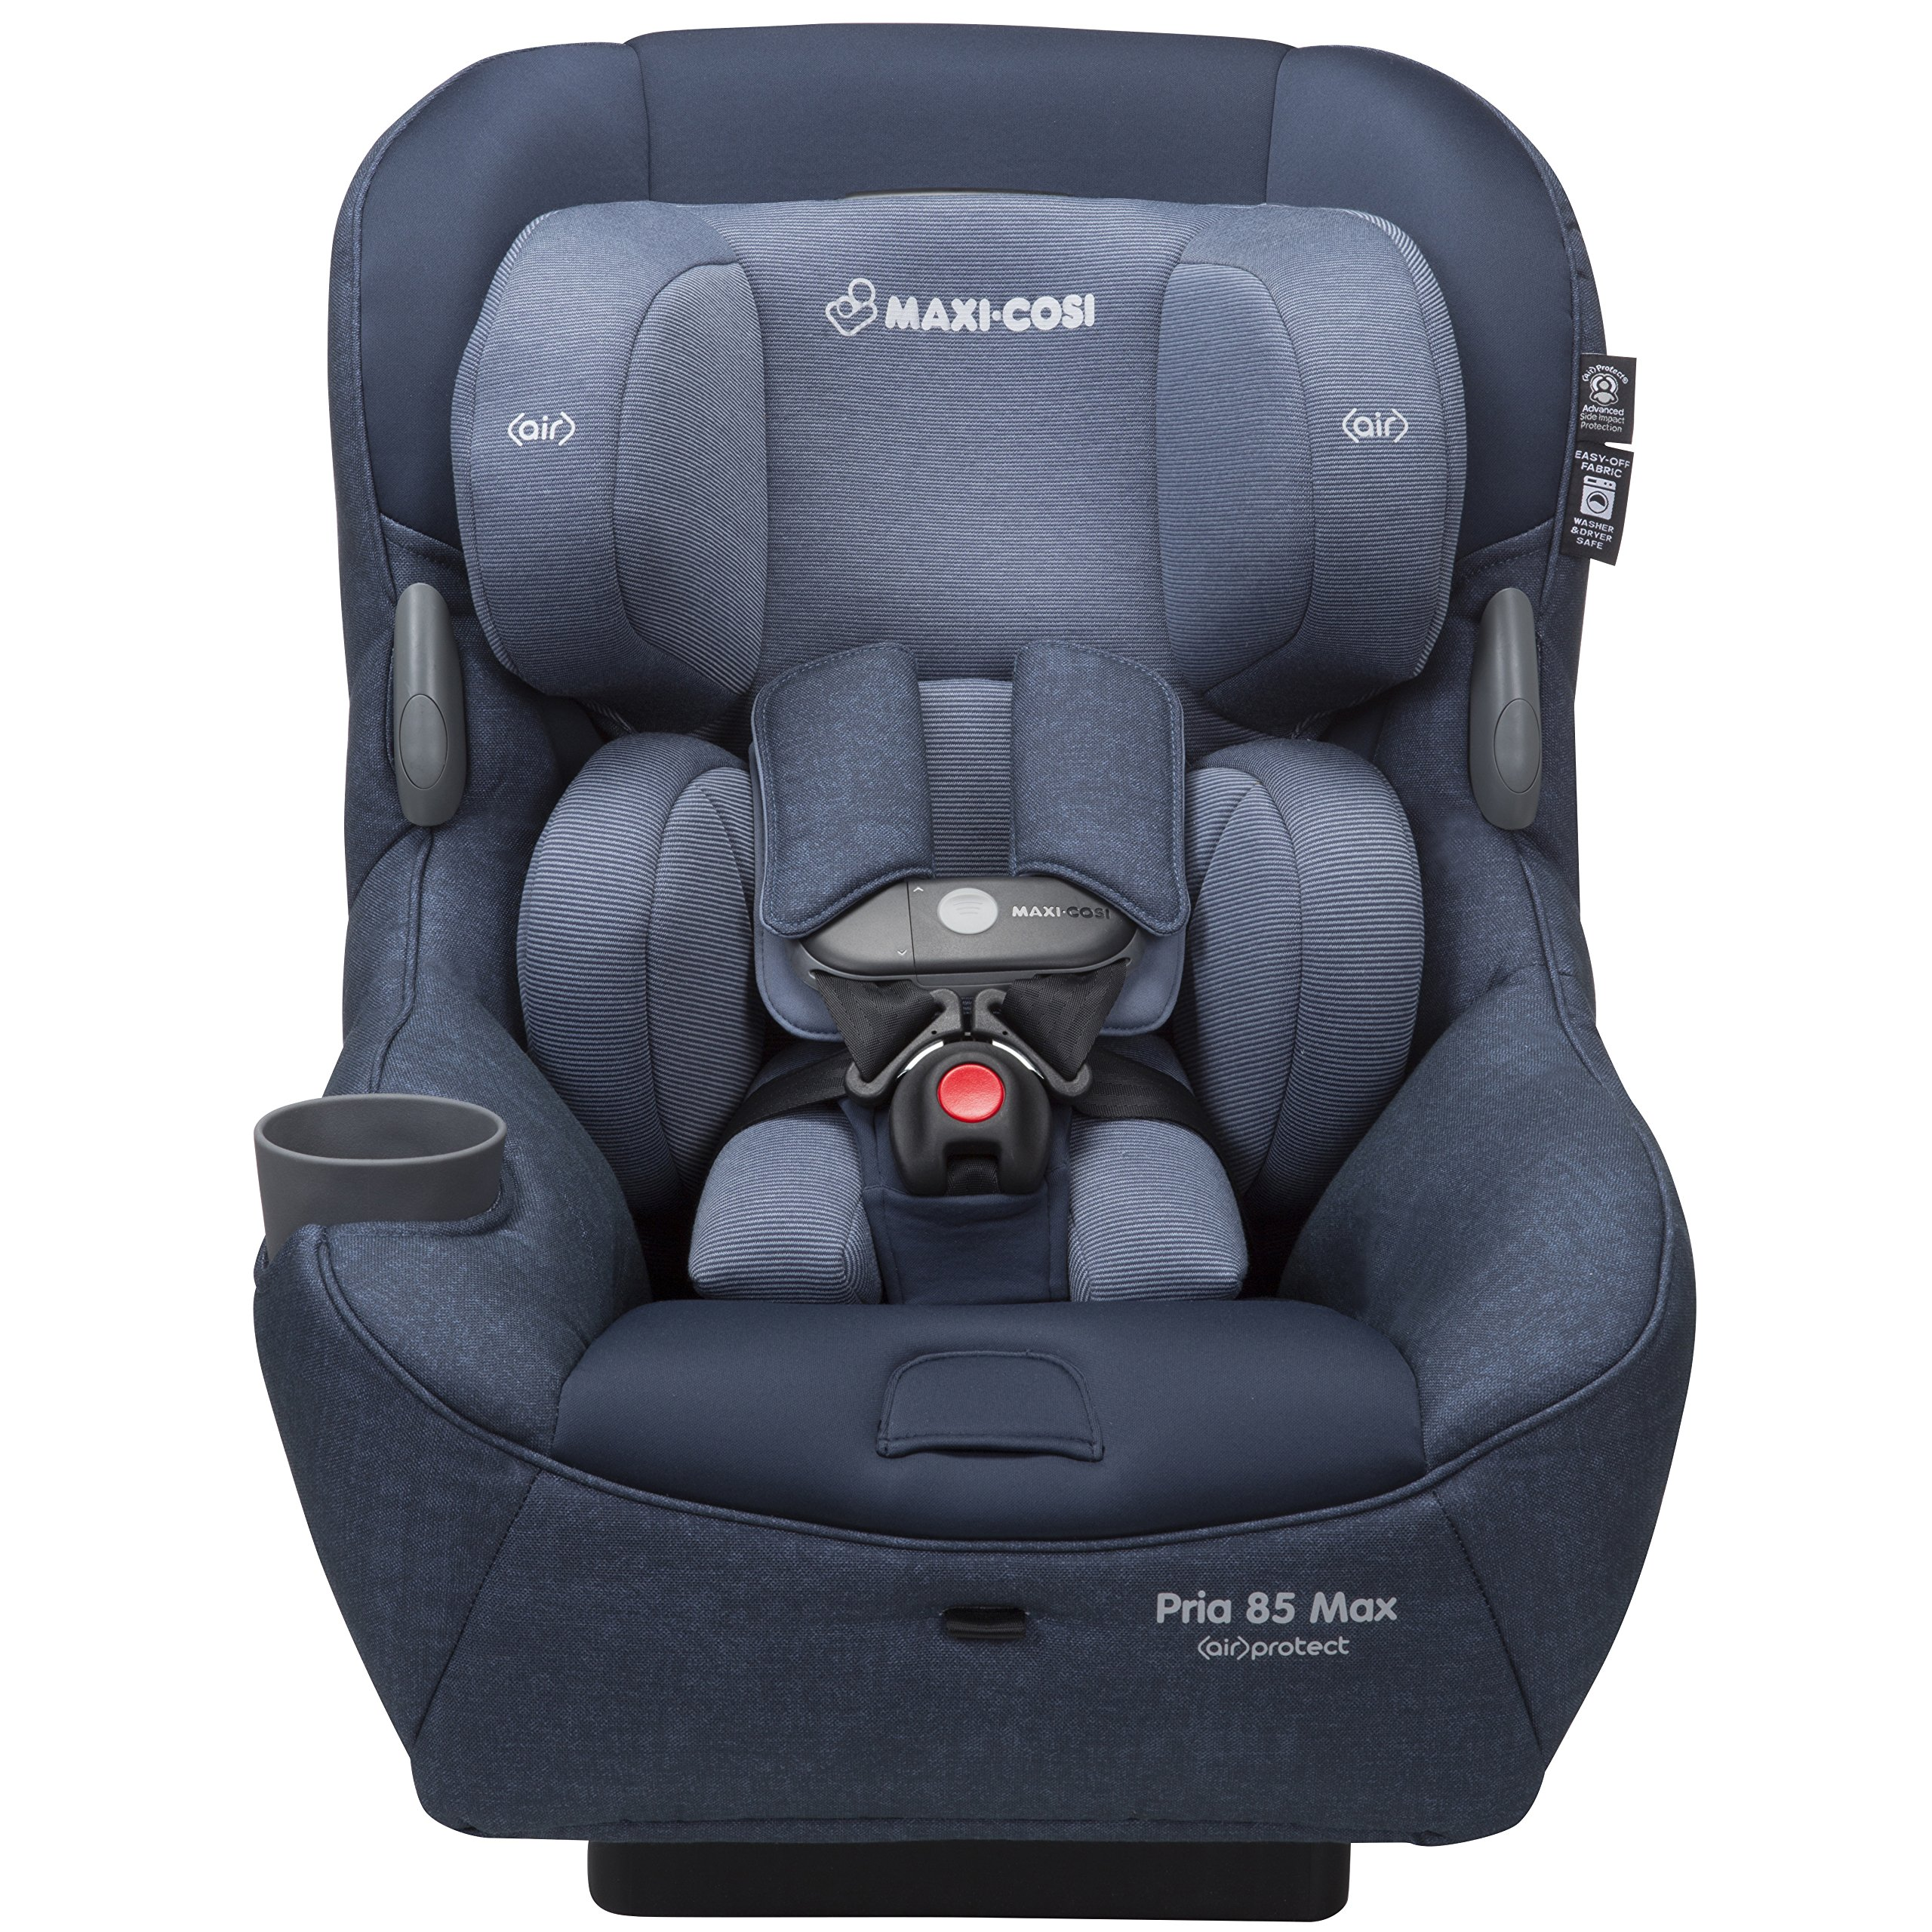 Maxi Cosi Max Convertible Car Seat